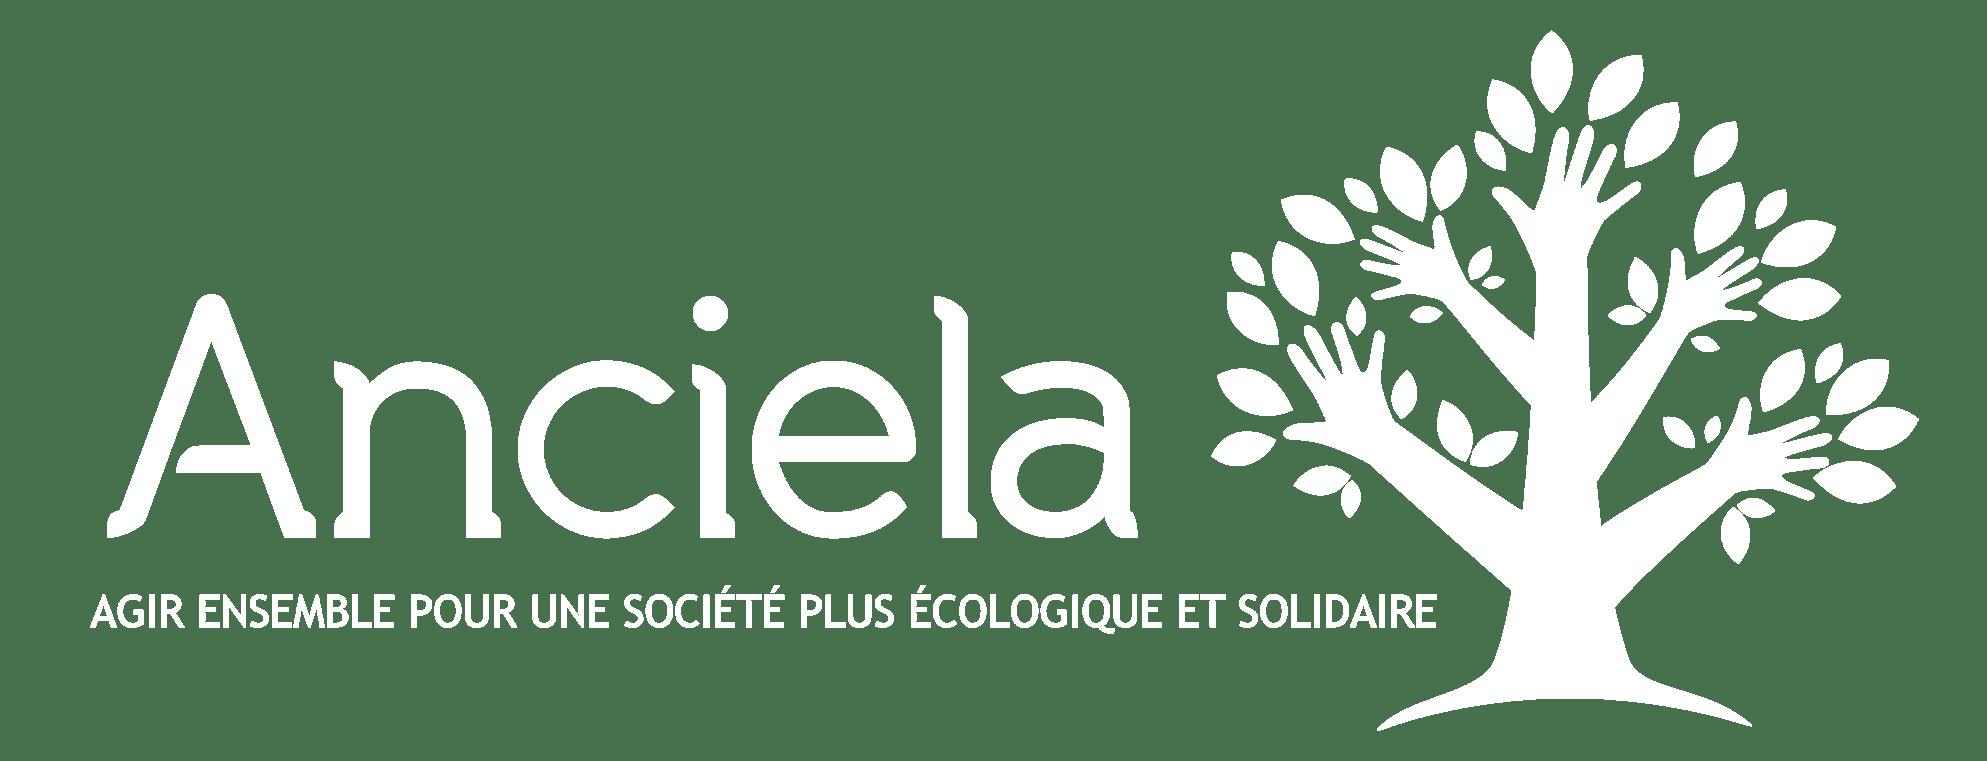 Logo anciela du bandeau de bas de page